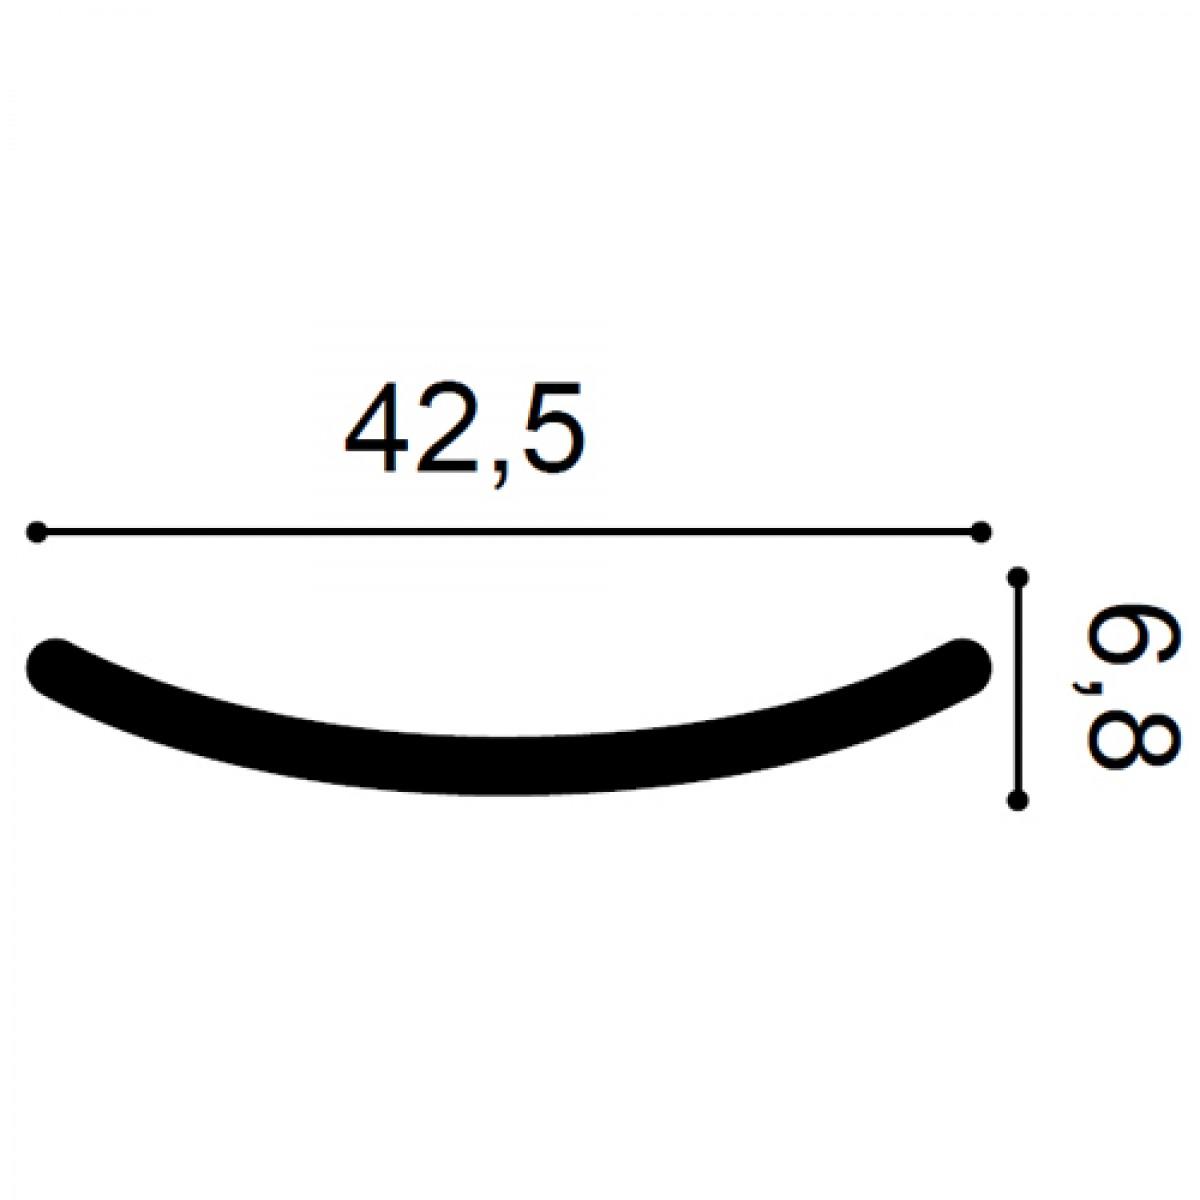 Element Decorativ Ulf Moritz G72, Dimensiuni: 42.5 X 6.8 X 1 cm, Orac Decor